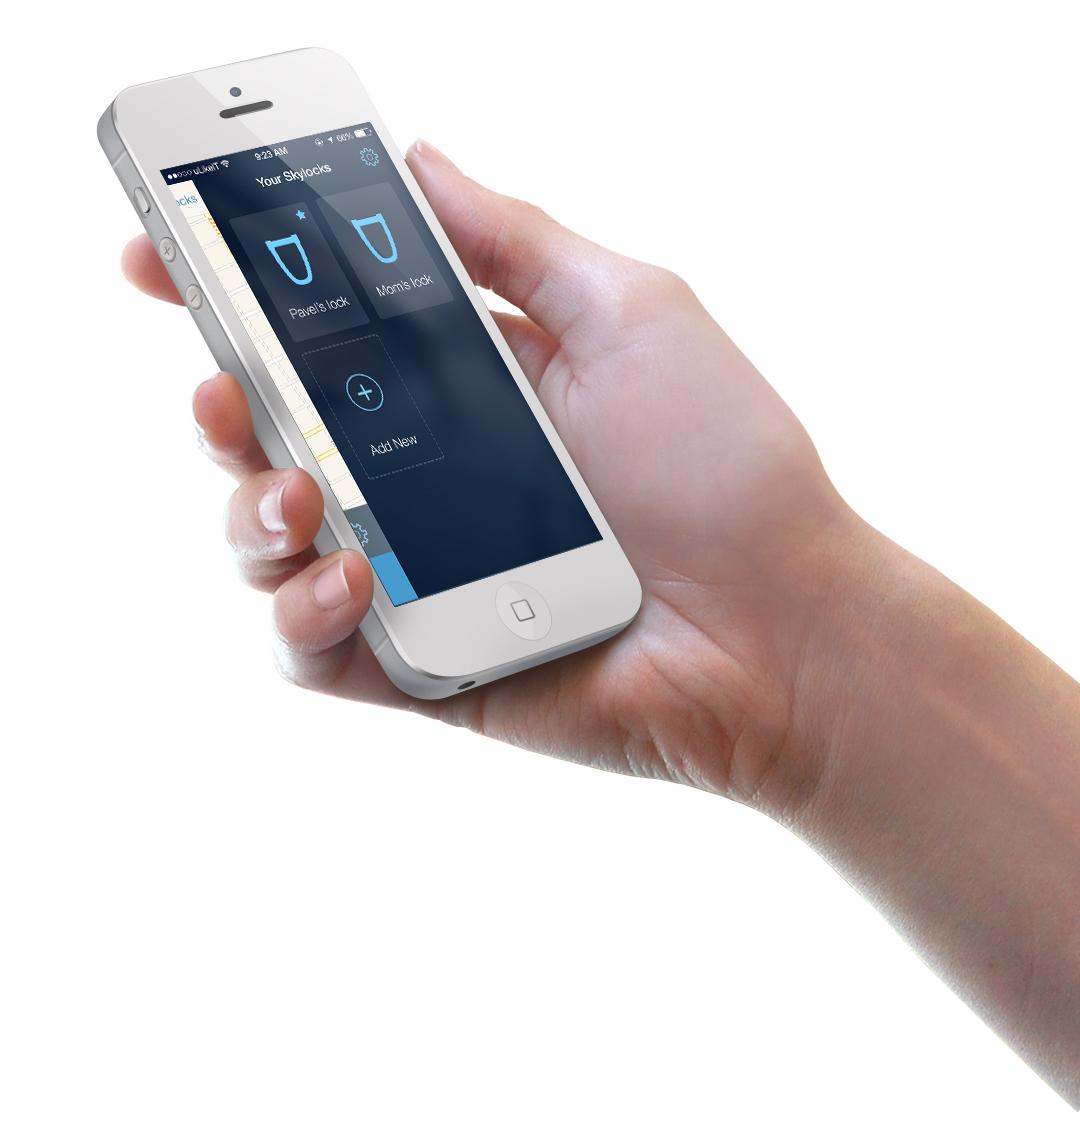 20140609222452-hand_iphone